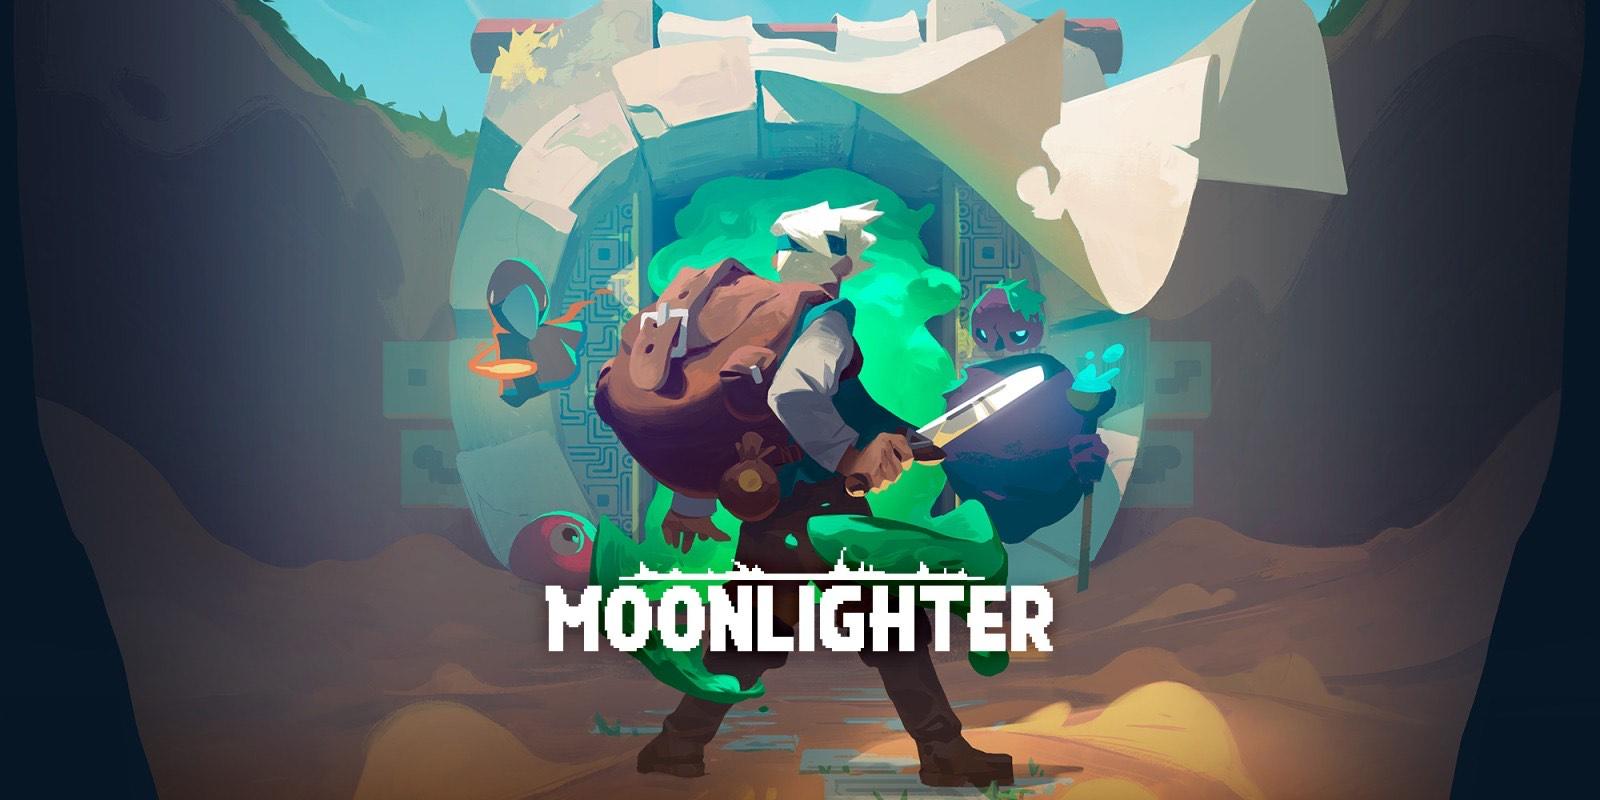 Moonlighter Nintendo Switch eShop